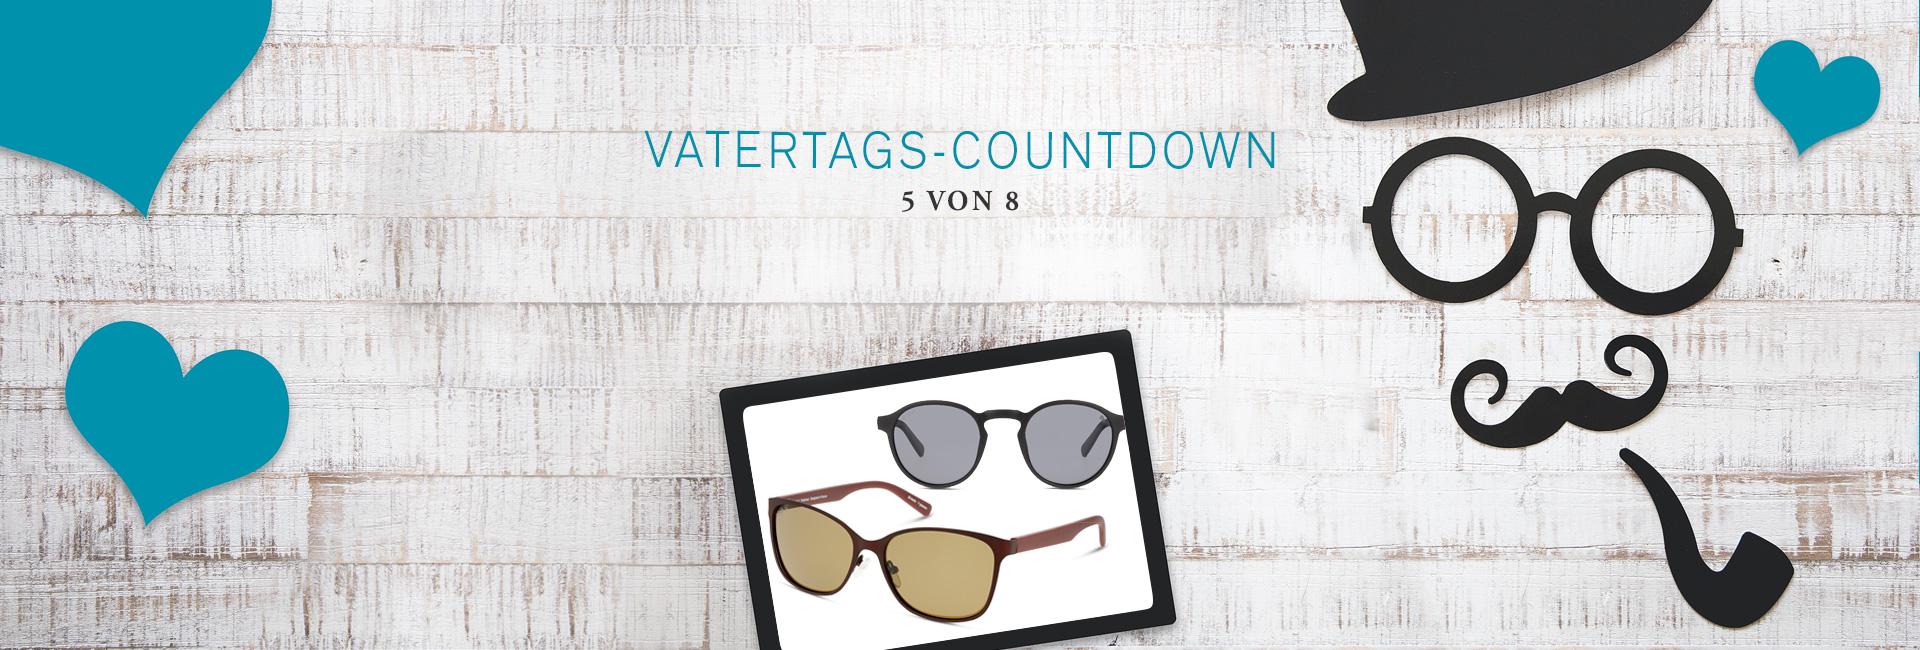 👔 DBYD Recycled Sonnenbrille von Pearle